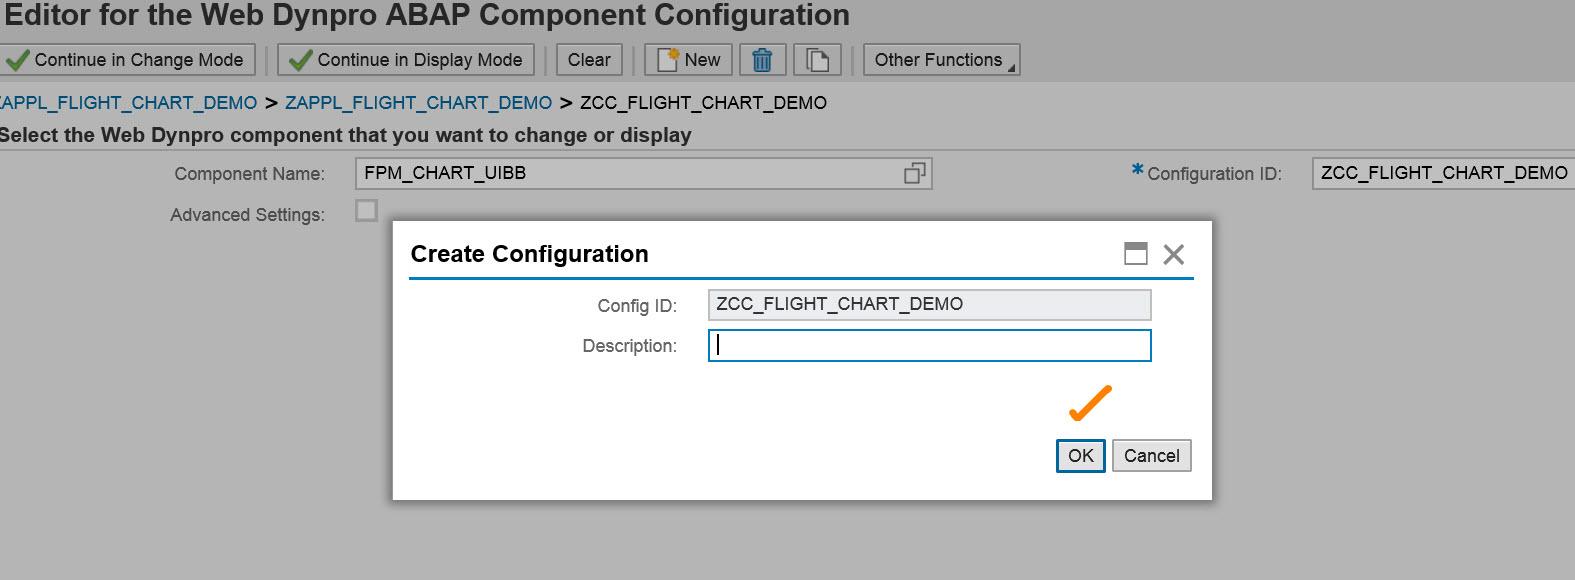 Okl Chart Okl2 Wiring Diagram Creating Uibb In Fpm Sapcodes